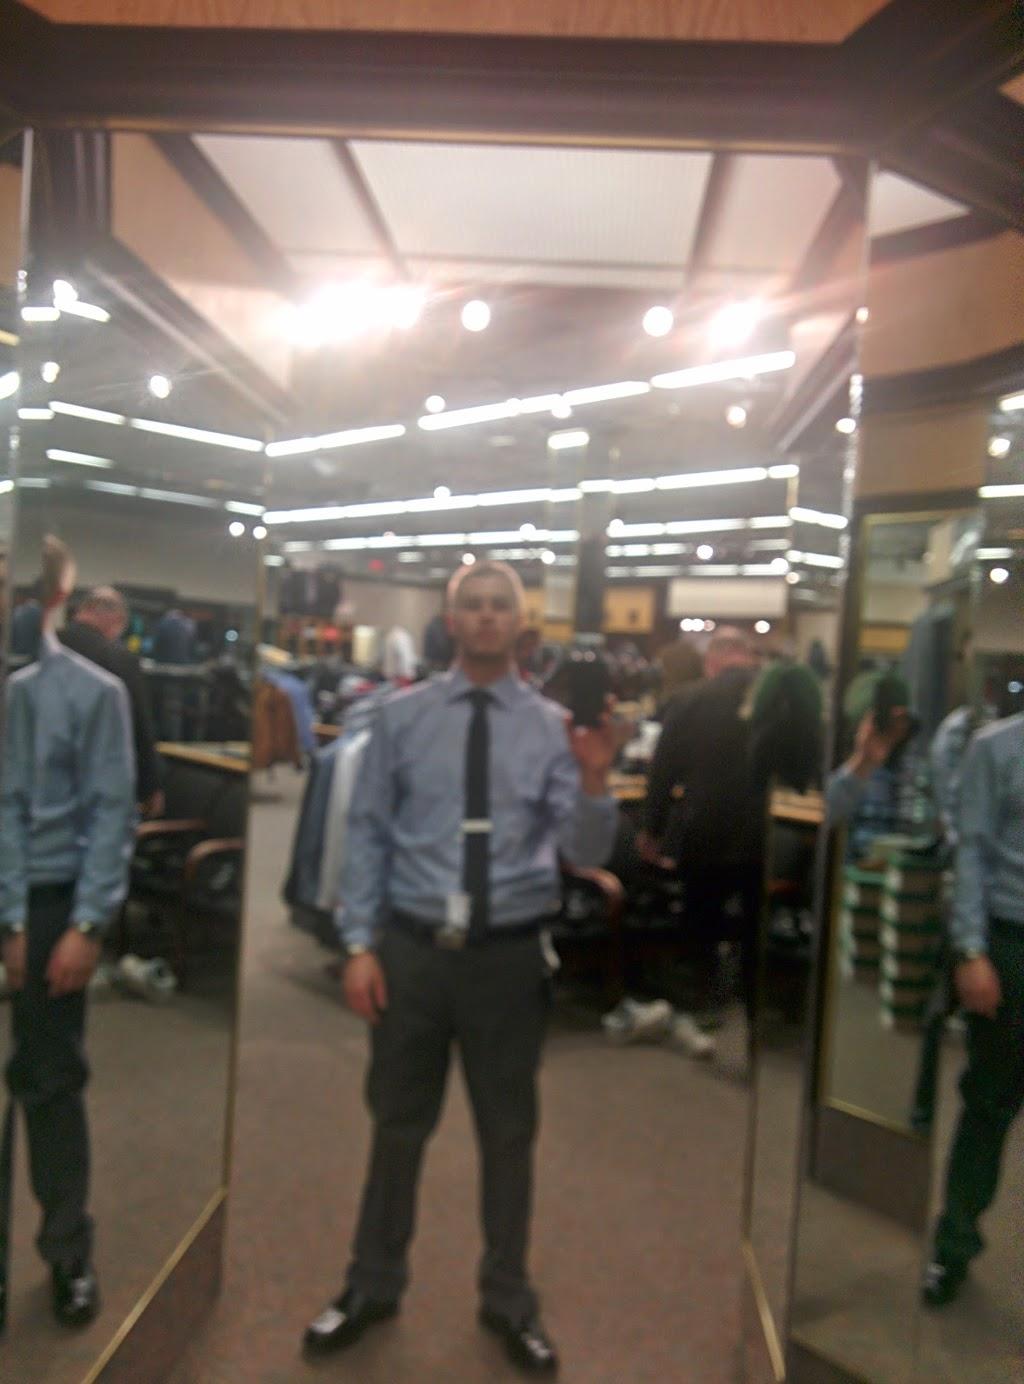 Moores Clothing for Men | clothing store | 845 Dakota St, Winnipeg, MB R2M 5M3, Canada | 2042557351 OR +1 204-255-7351